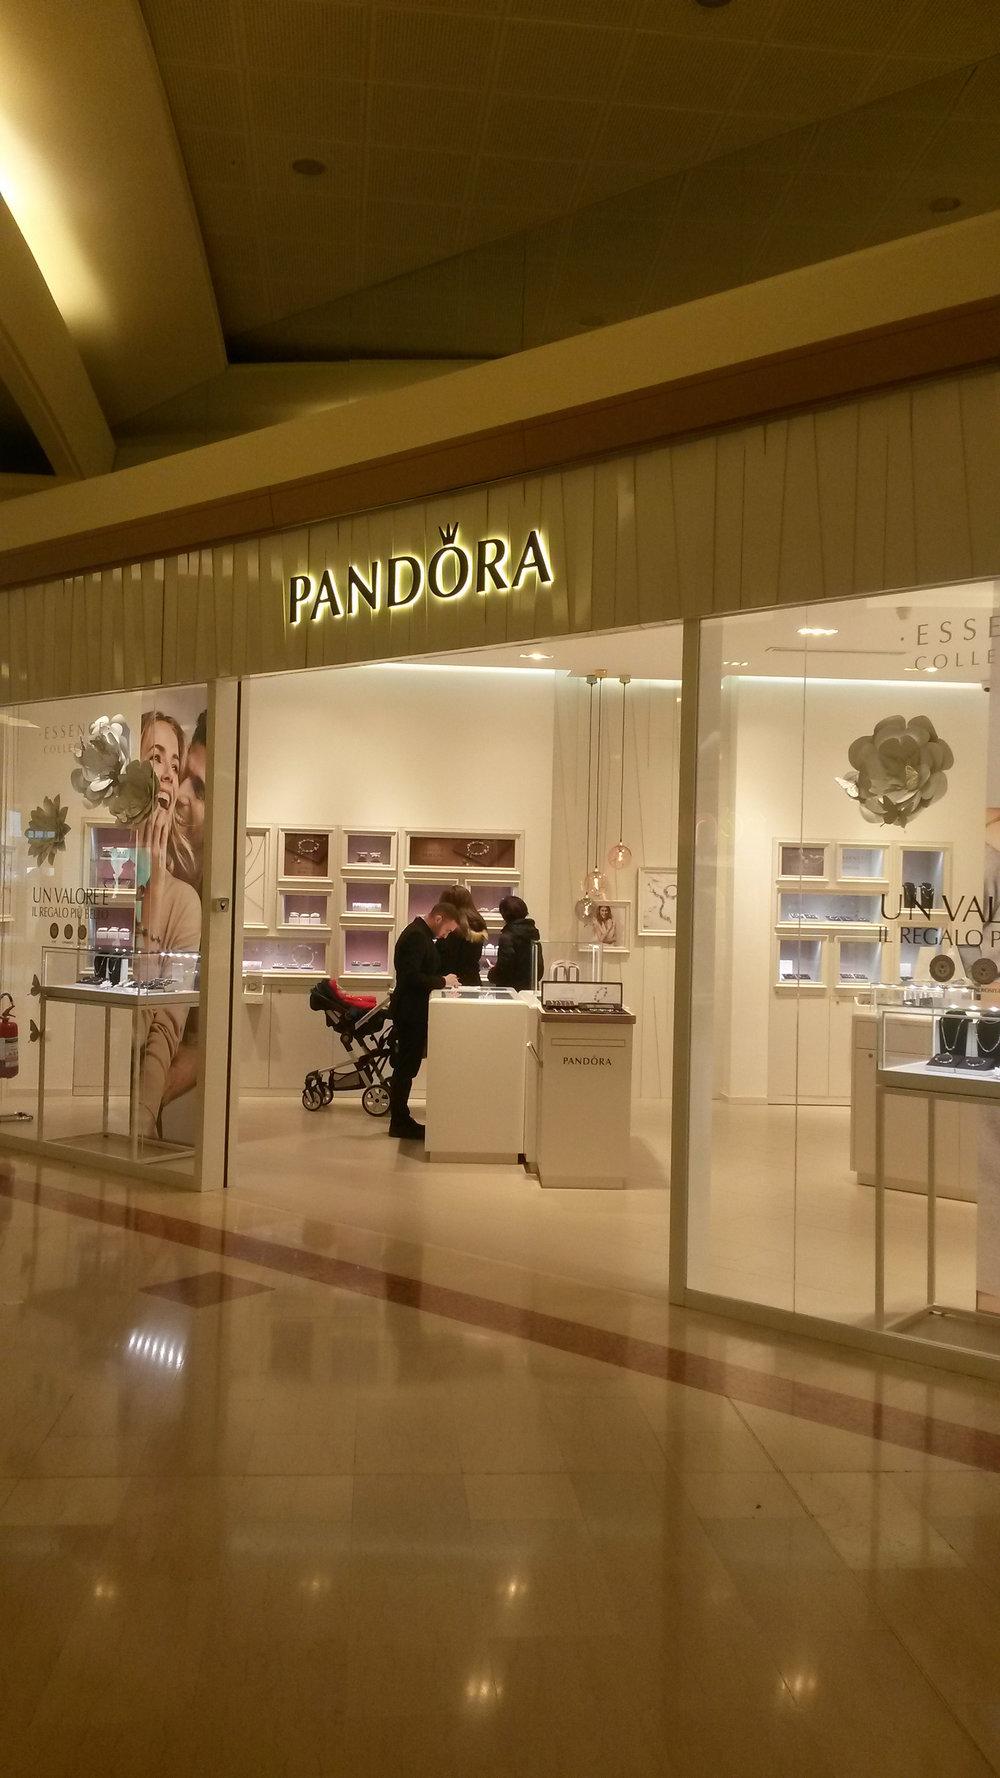 Pandora2.jpg